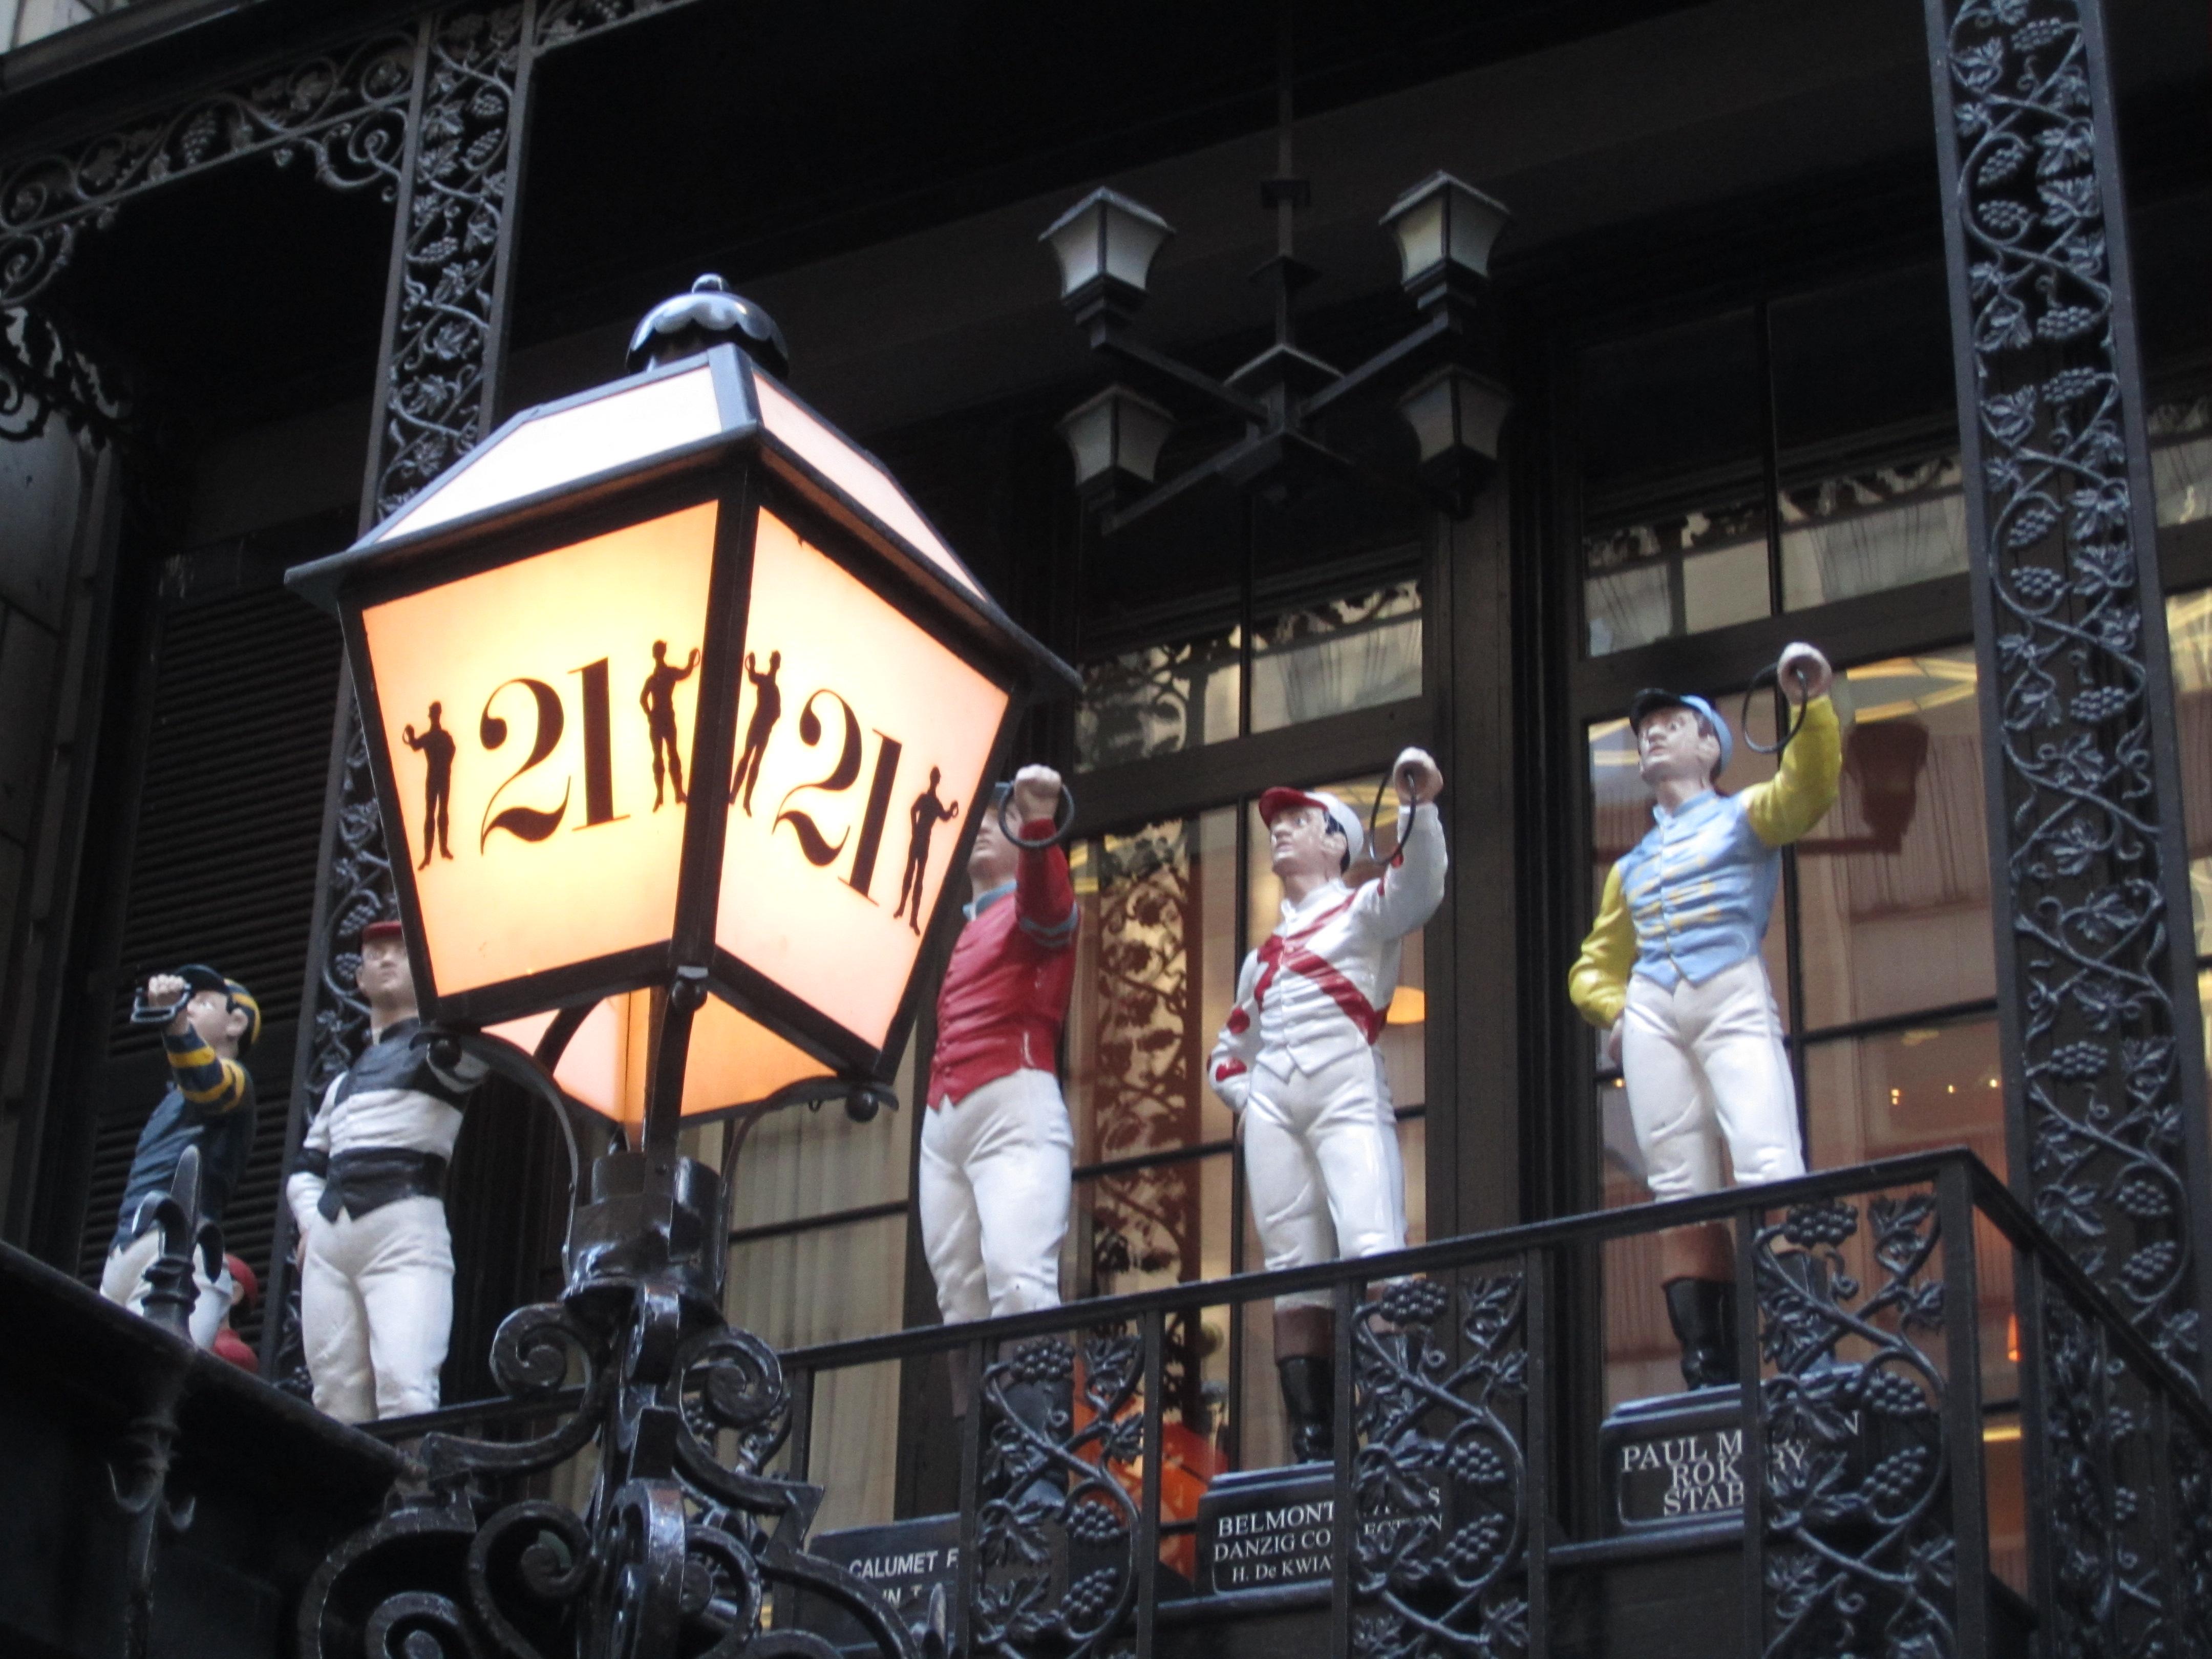 21-club-restaurants-nyc